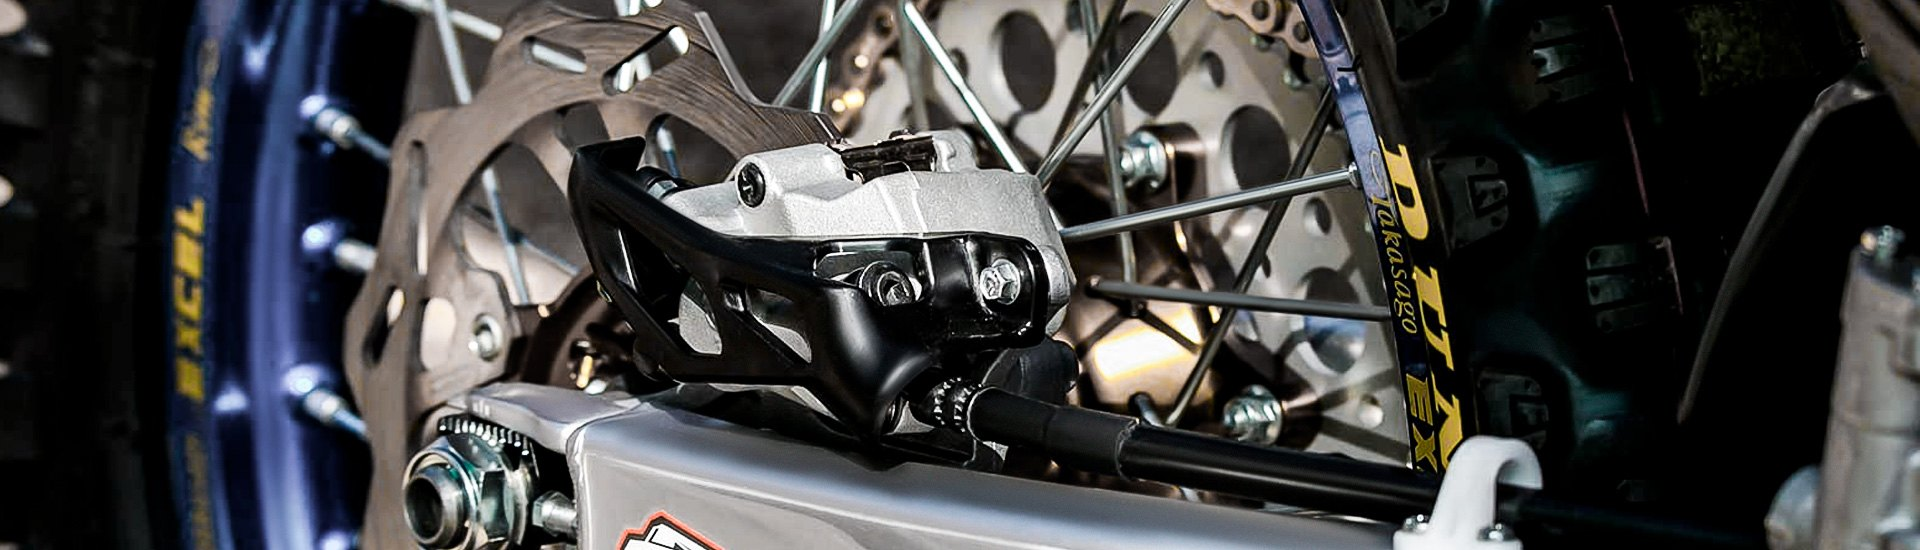 2001 Yamaha TTR250 Brake Parts | Pads, Calipers, Rotors, Lines